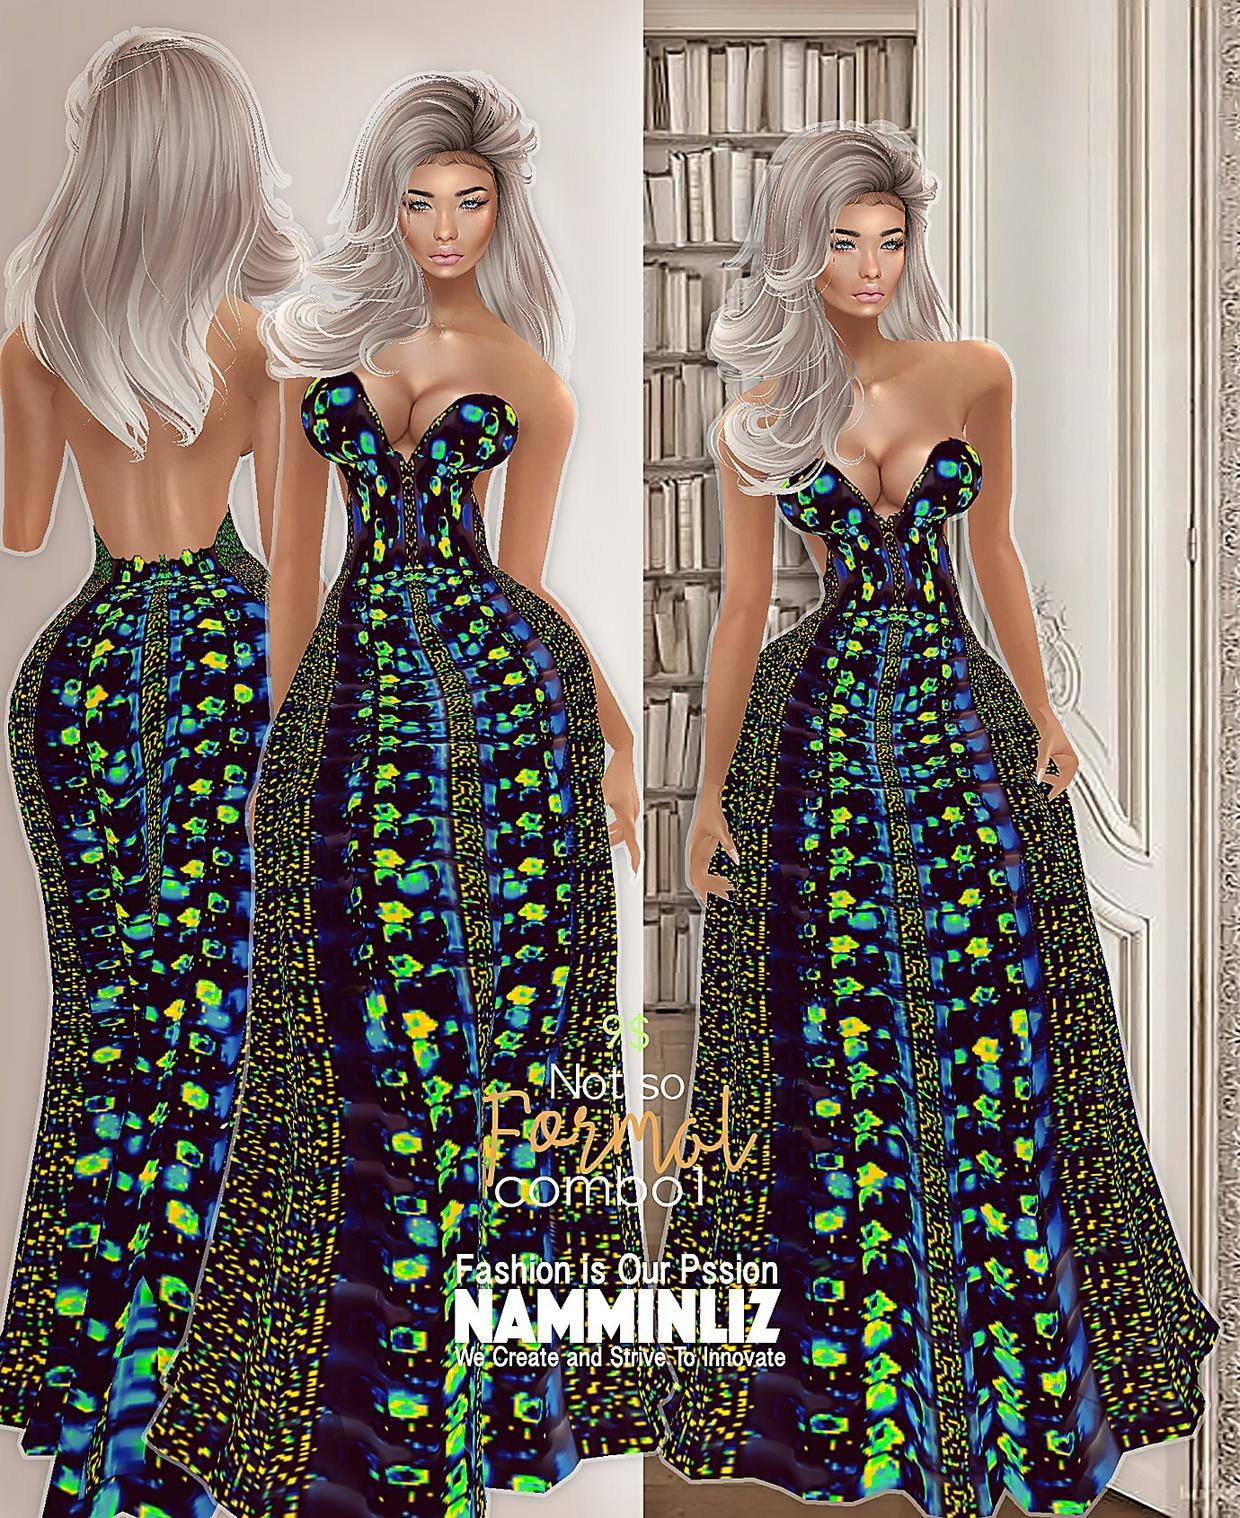 C O M B O1 Not so Formal Collection Dress Bibirasta all sizes